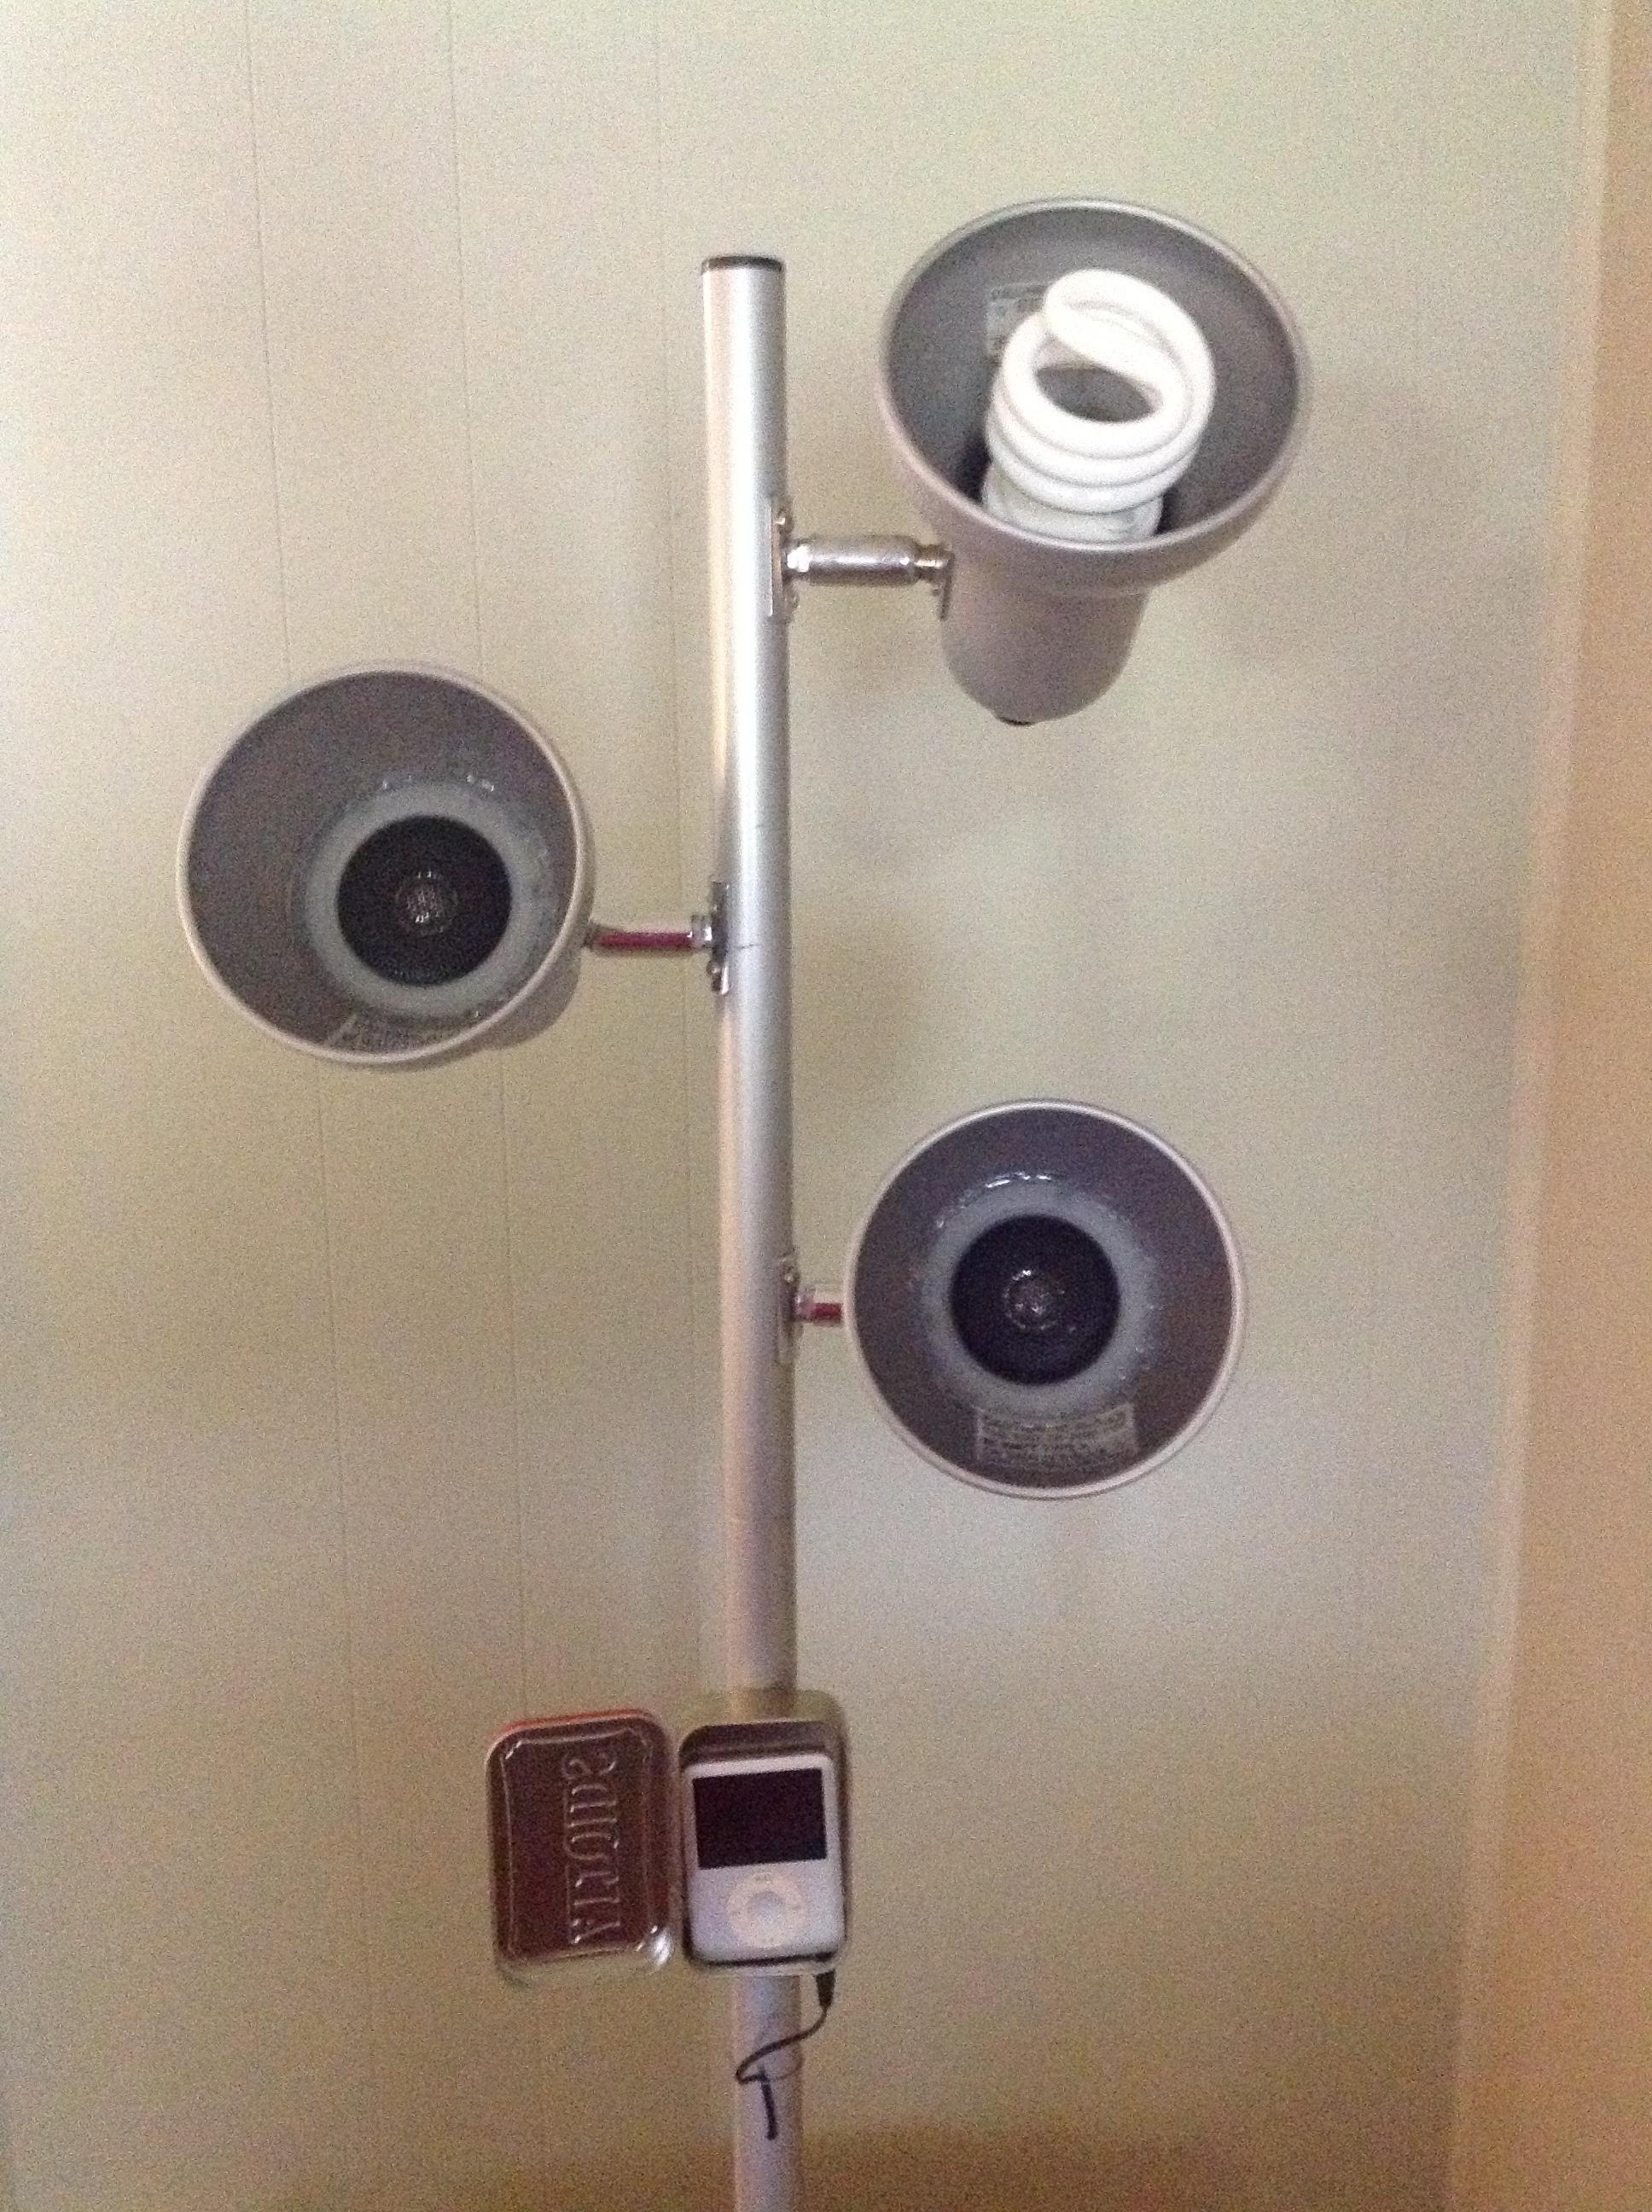 Turn Lamp Into Speaker Tower